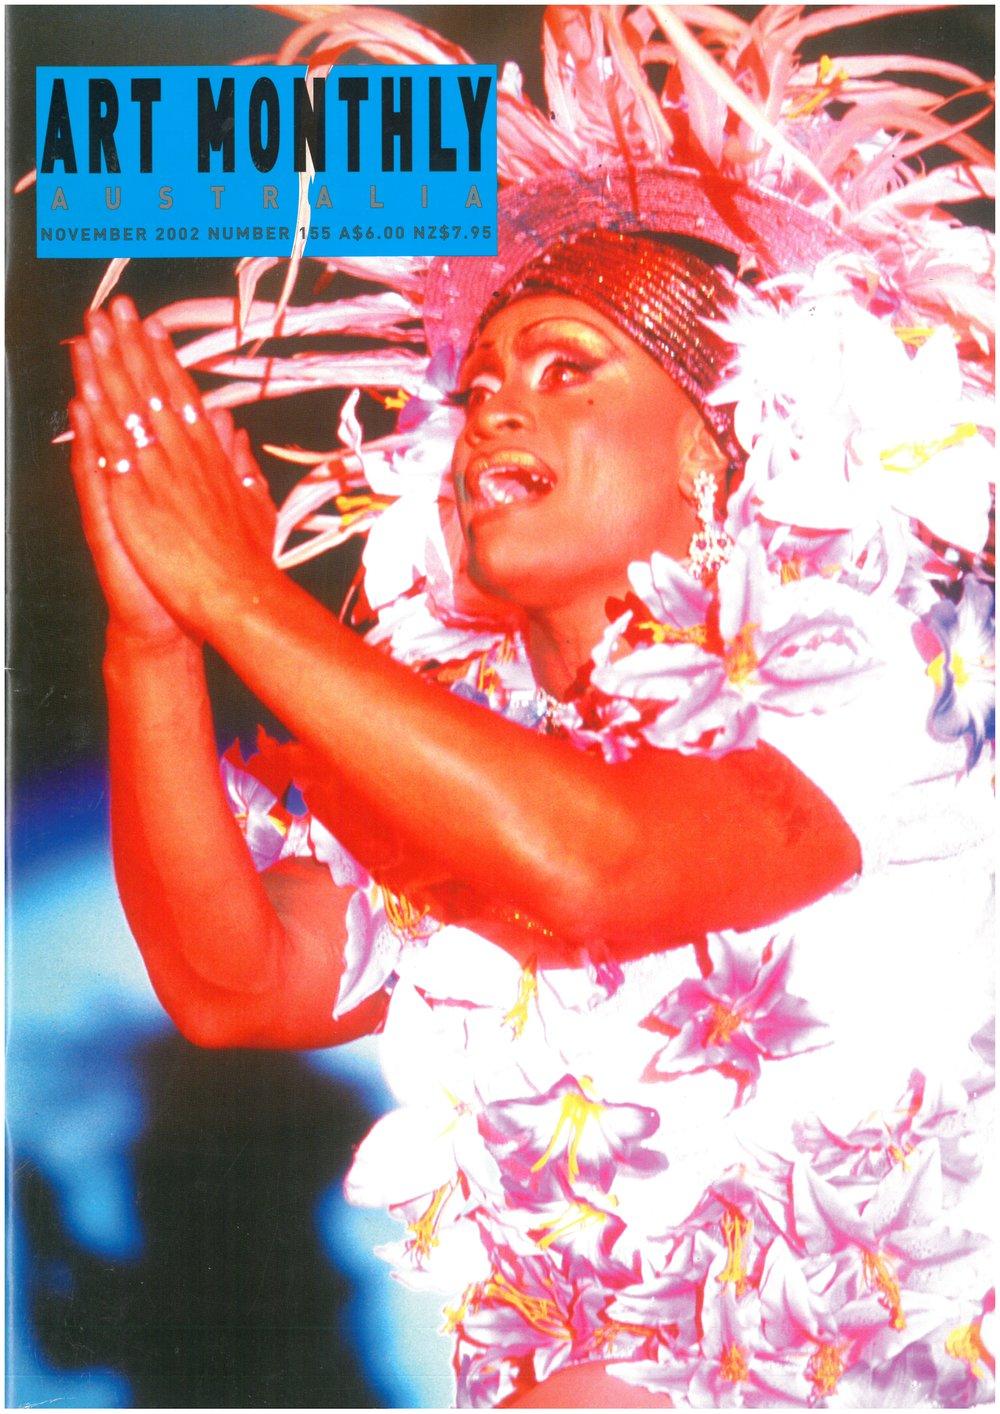 Issue 155 November 2002